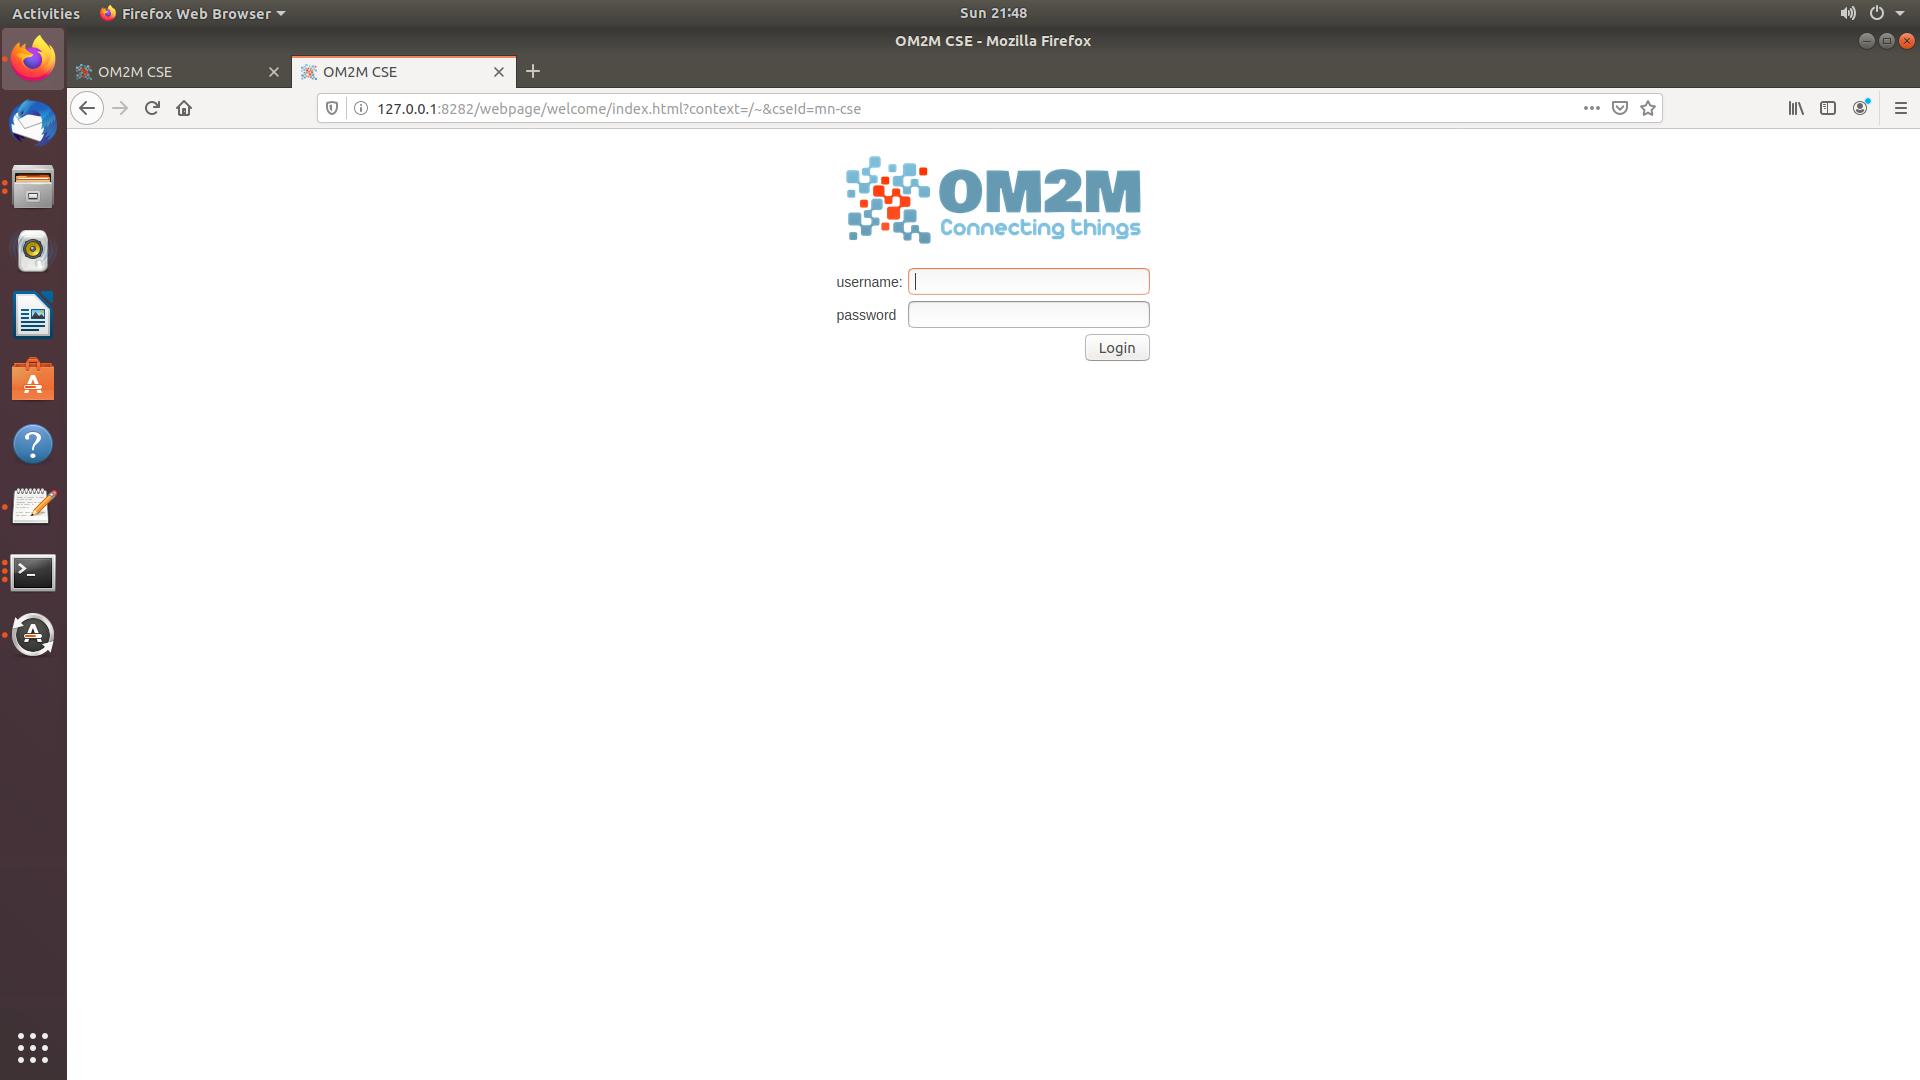 MN-CSE Login page